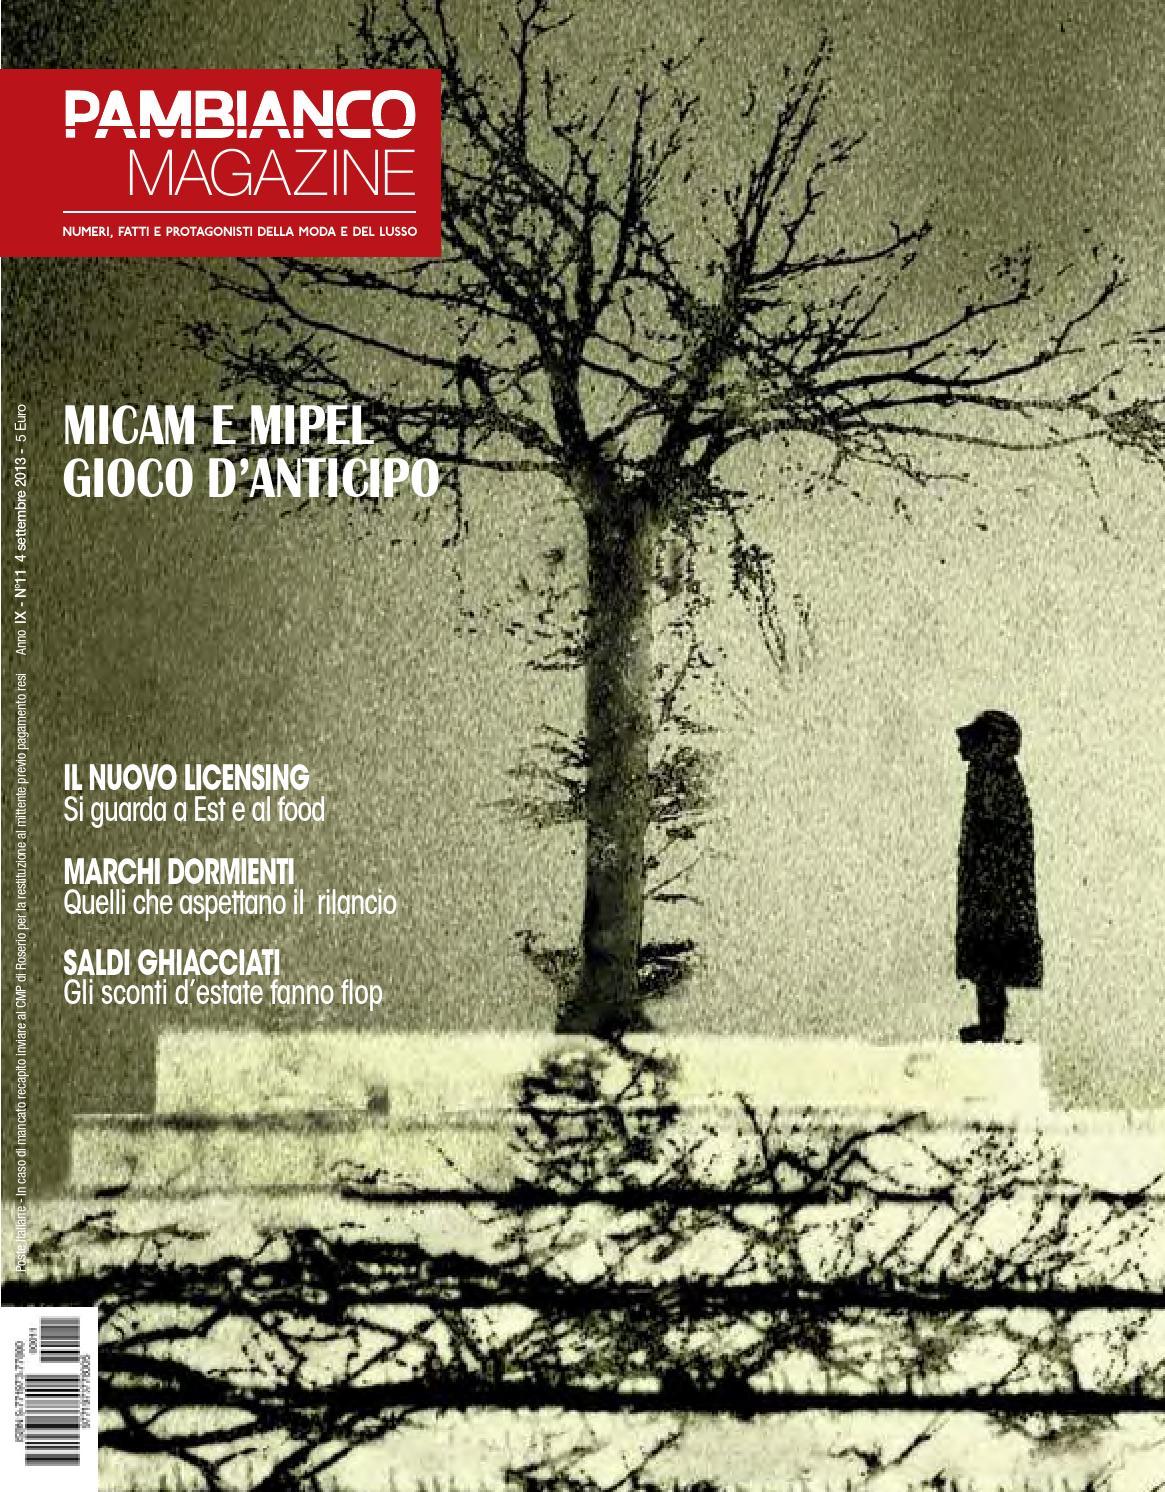 Magazine N Pambianconews Ix By Pambianco 11 Issuu qSpMVUzG